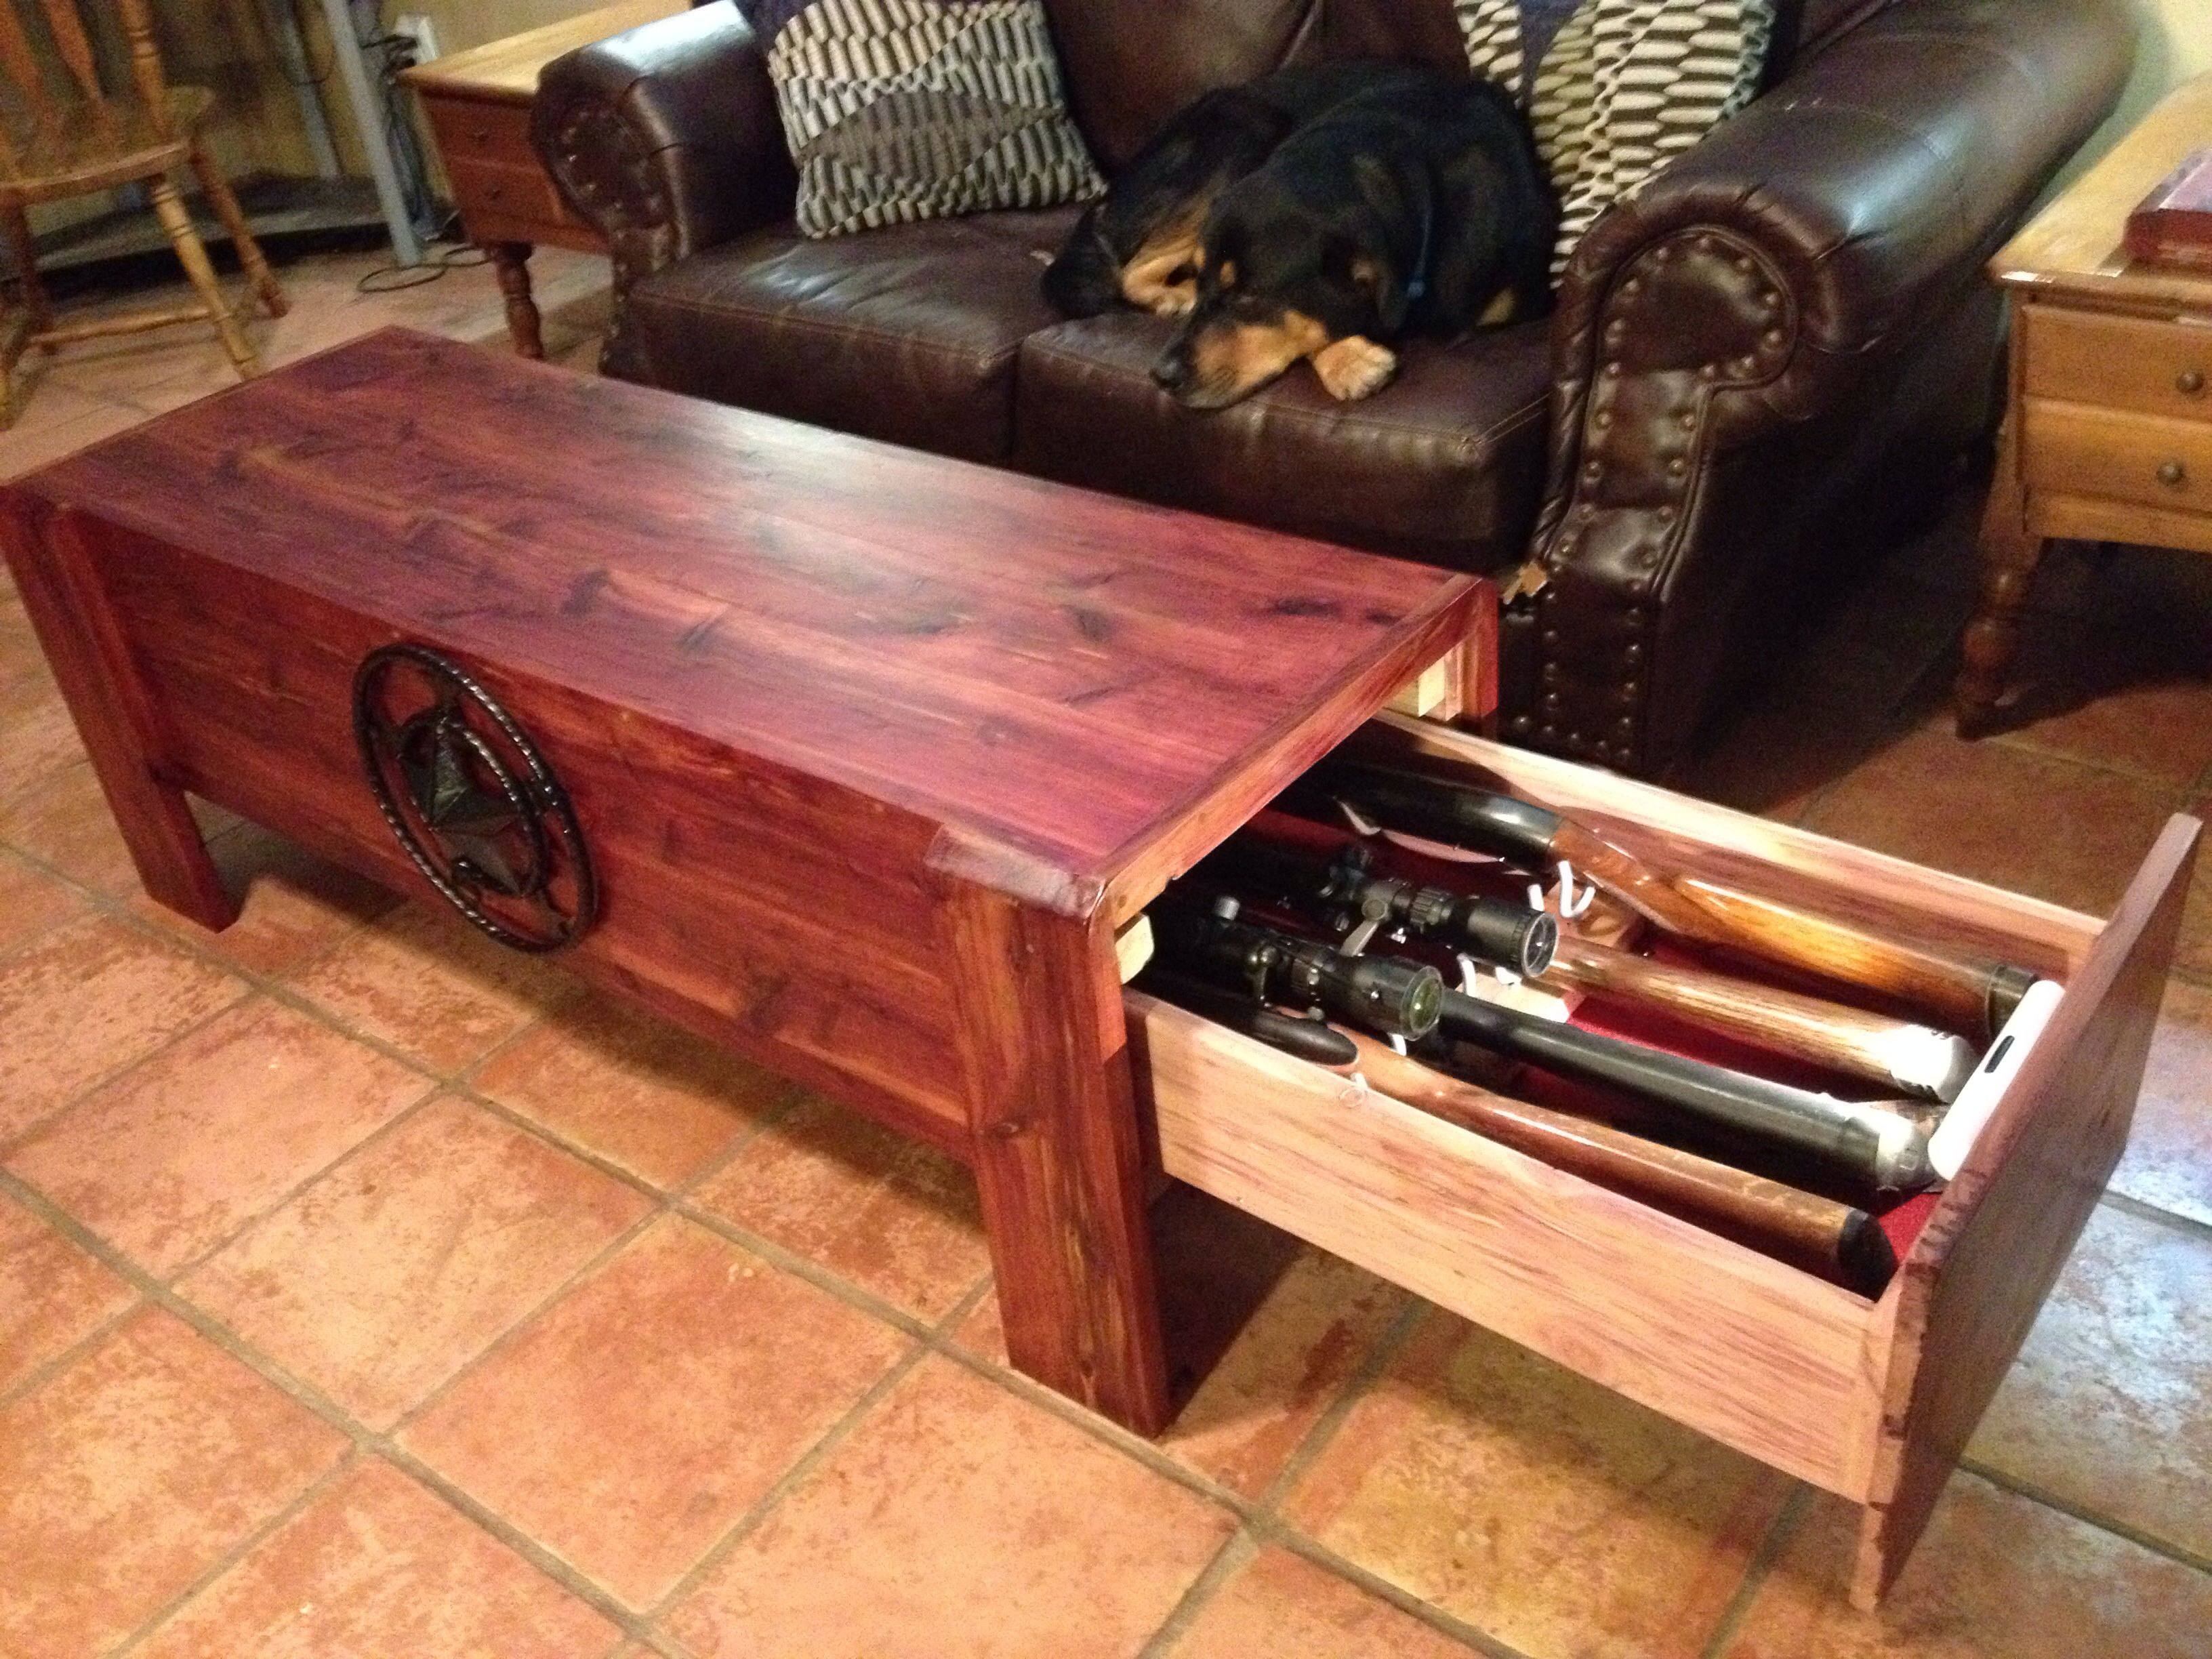 Sofa Gun Safe Bed Bedroom Ideas My 100 Cedar Concealed Coffee Table Ronbond Cmaaccess